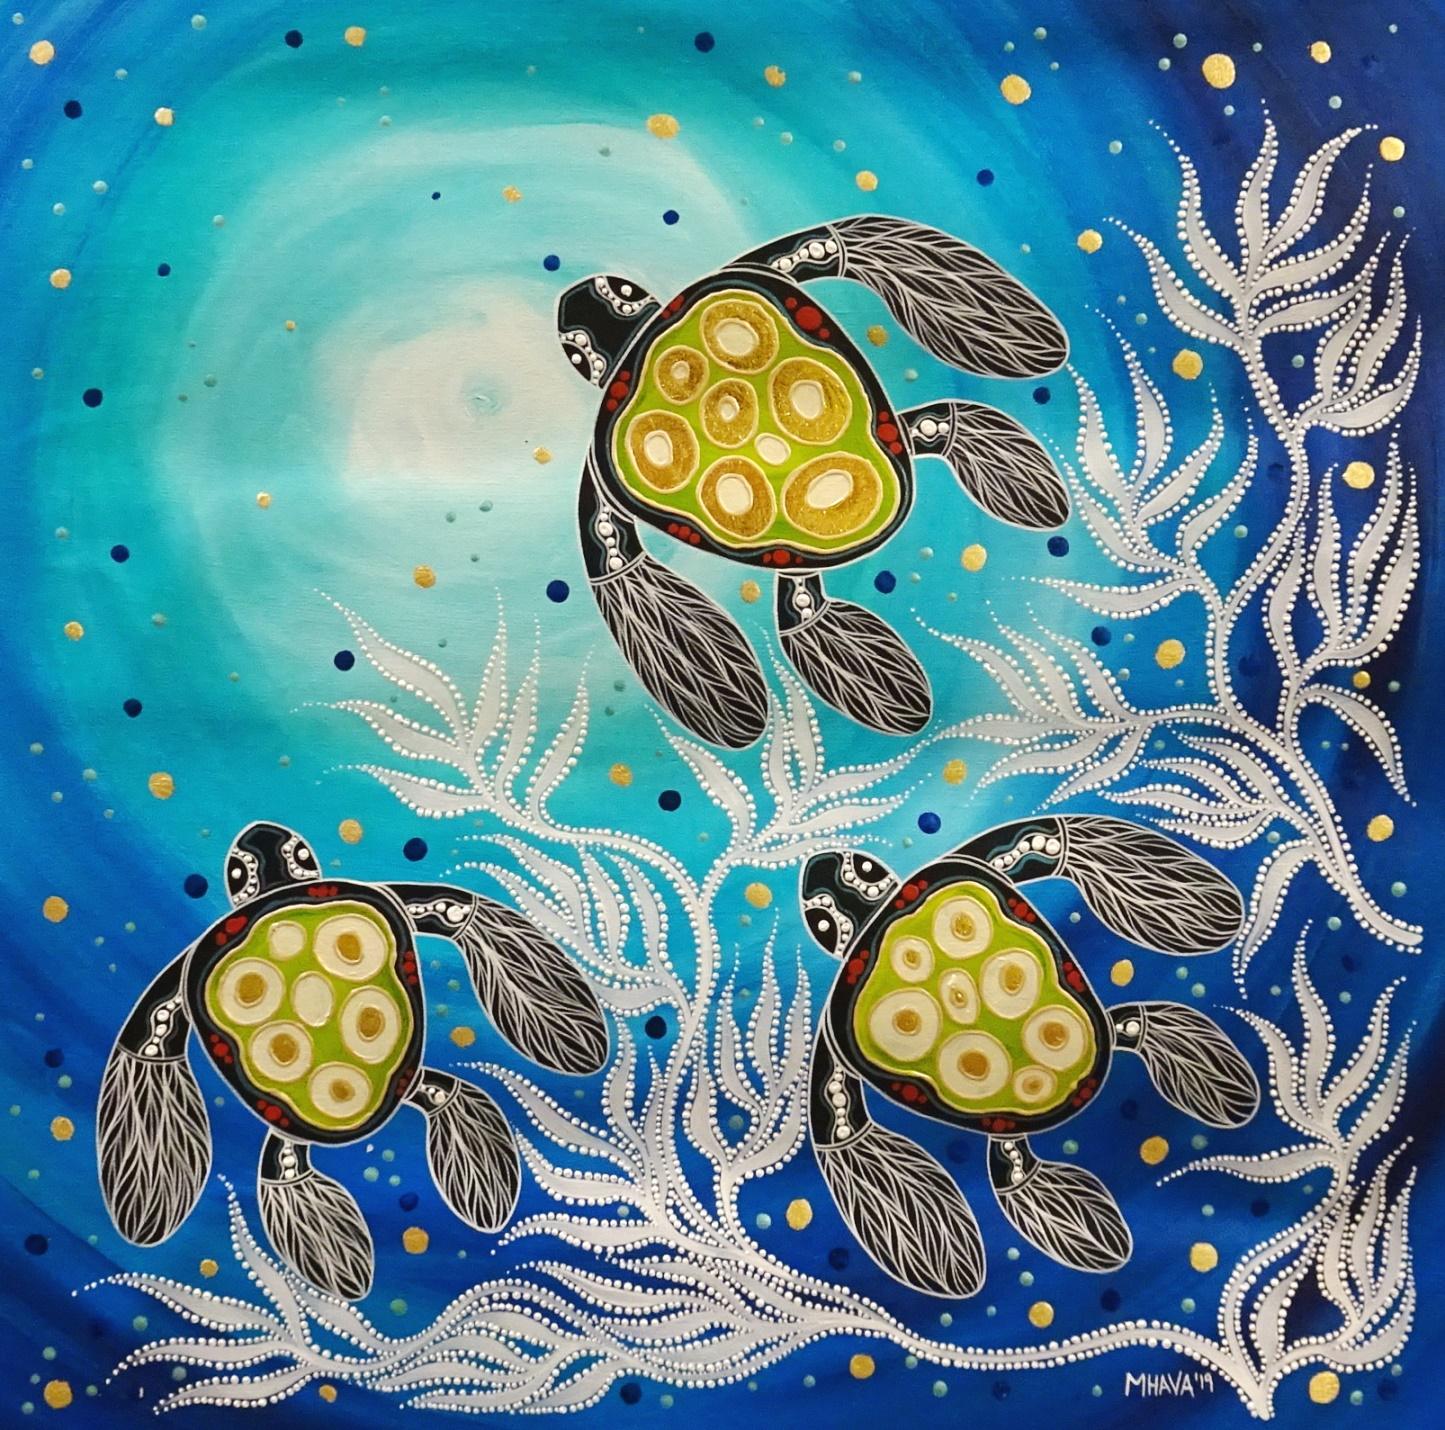 Melanie Hava Turtles Towards The Light 1a Artlandish